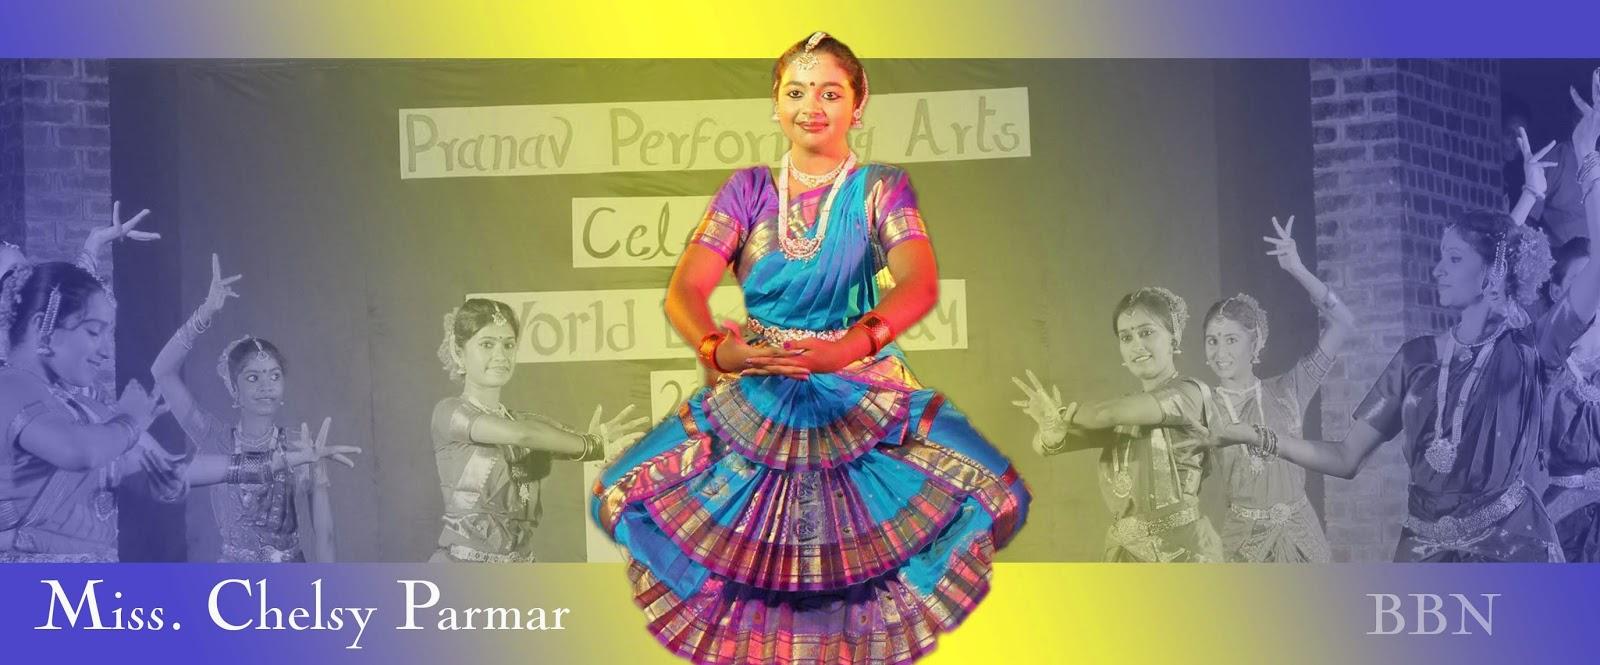 http://vijaymacwan.blogspot.in/2014/09/vibrant-youth-of-gujarat-church-miss.html